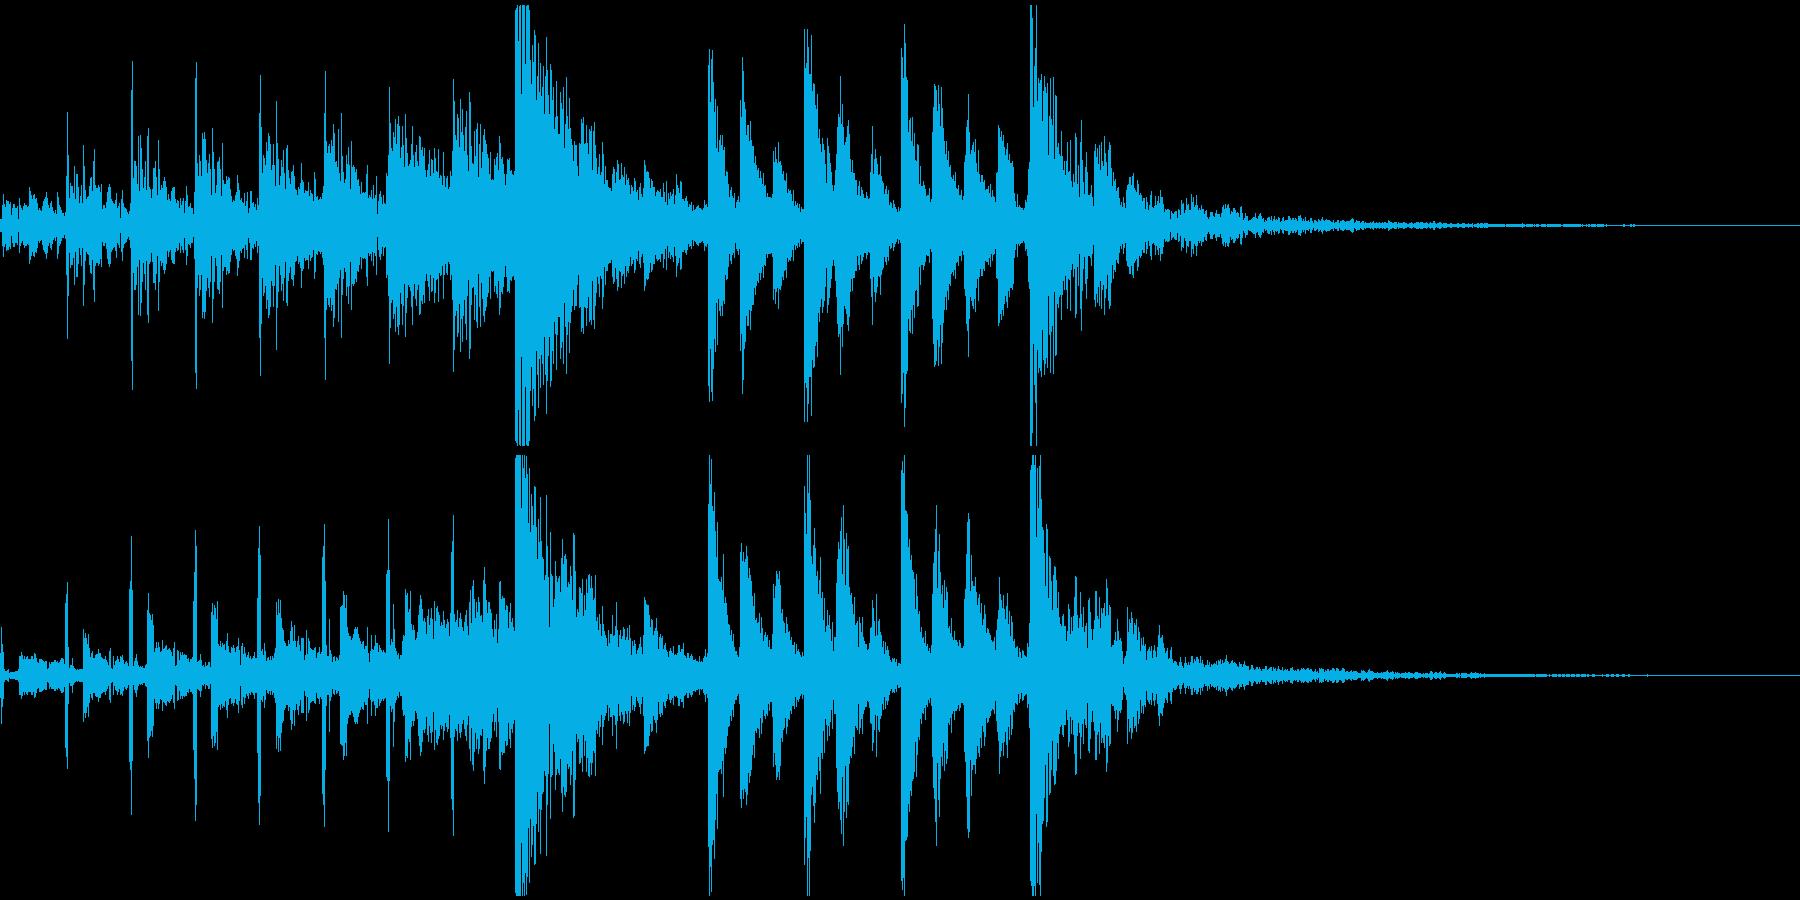 CM入りサウンドロゴ向けテクノ風ジングルの再生済みの波形